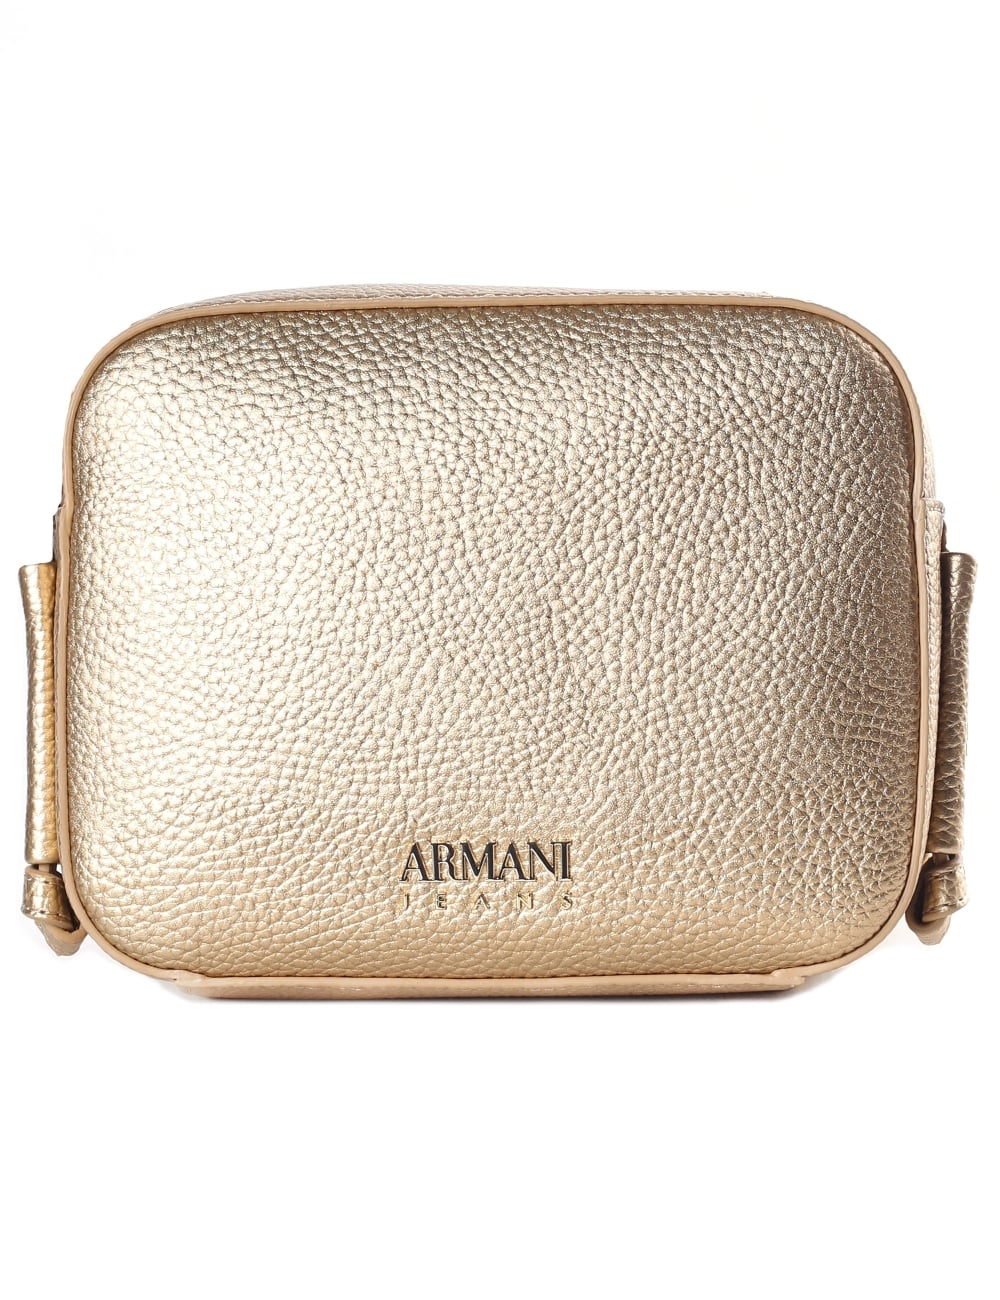 9b3eb103d2 Armani Jeans Women's Small Crossbody Bag